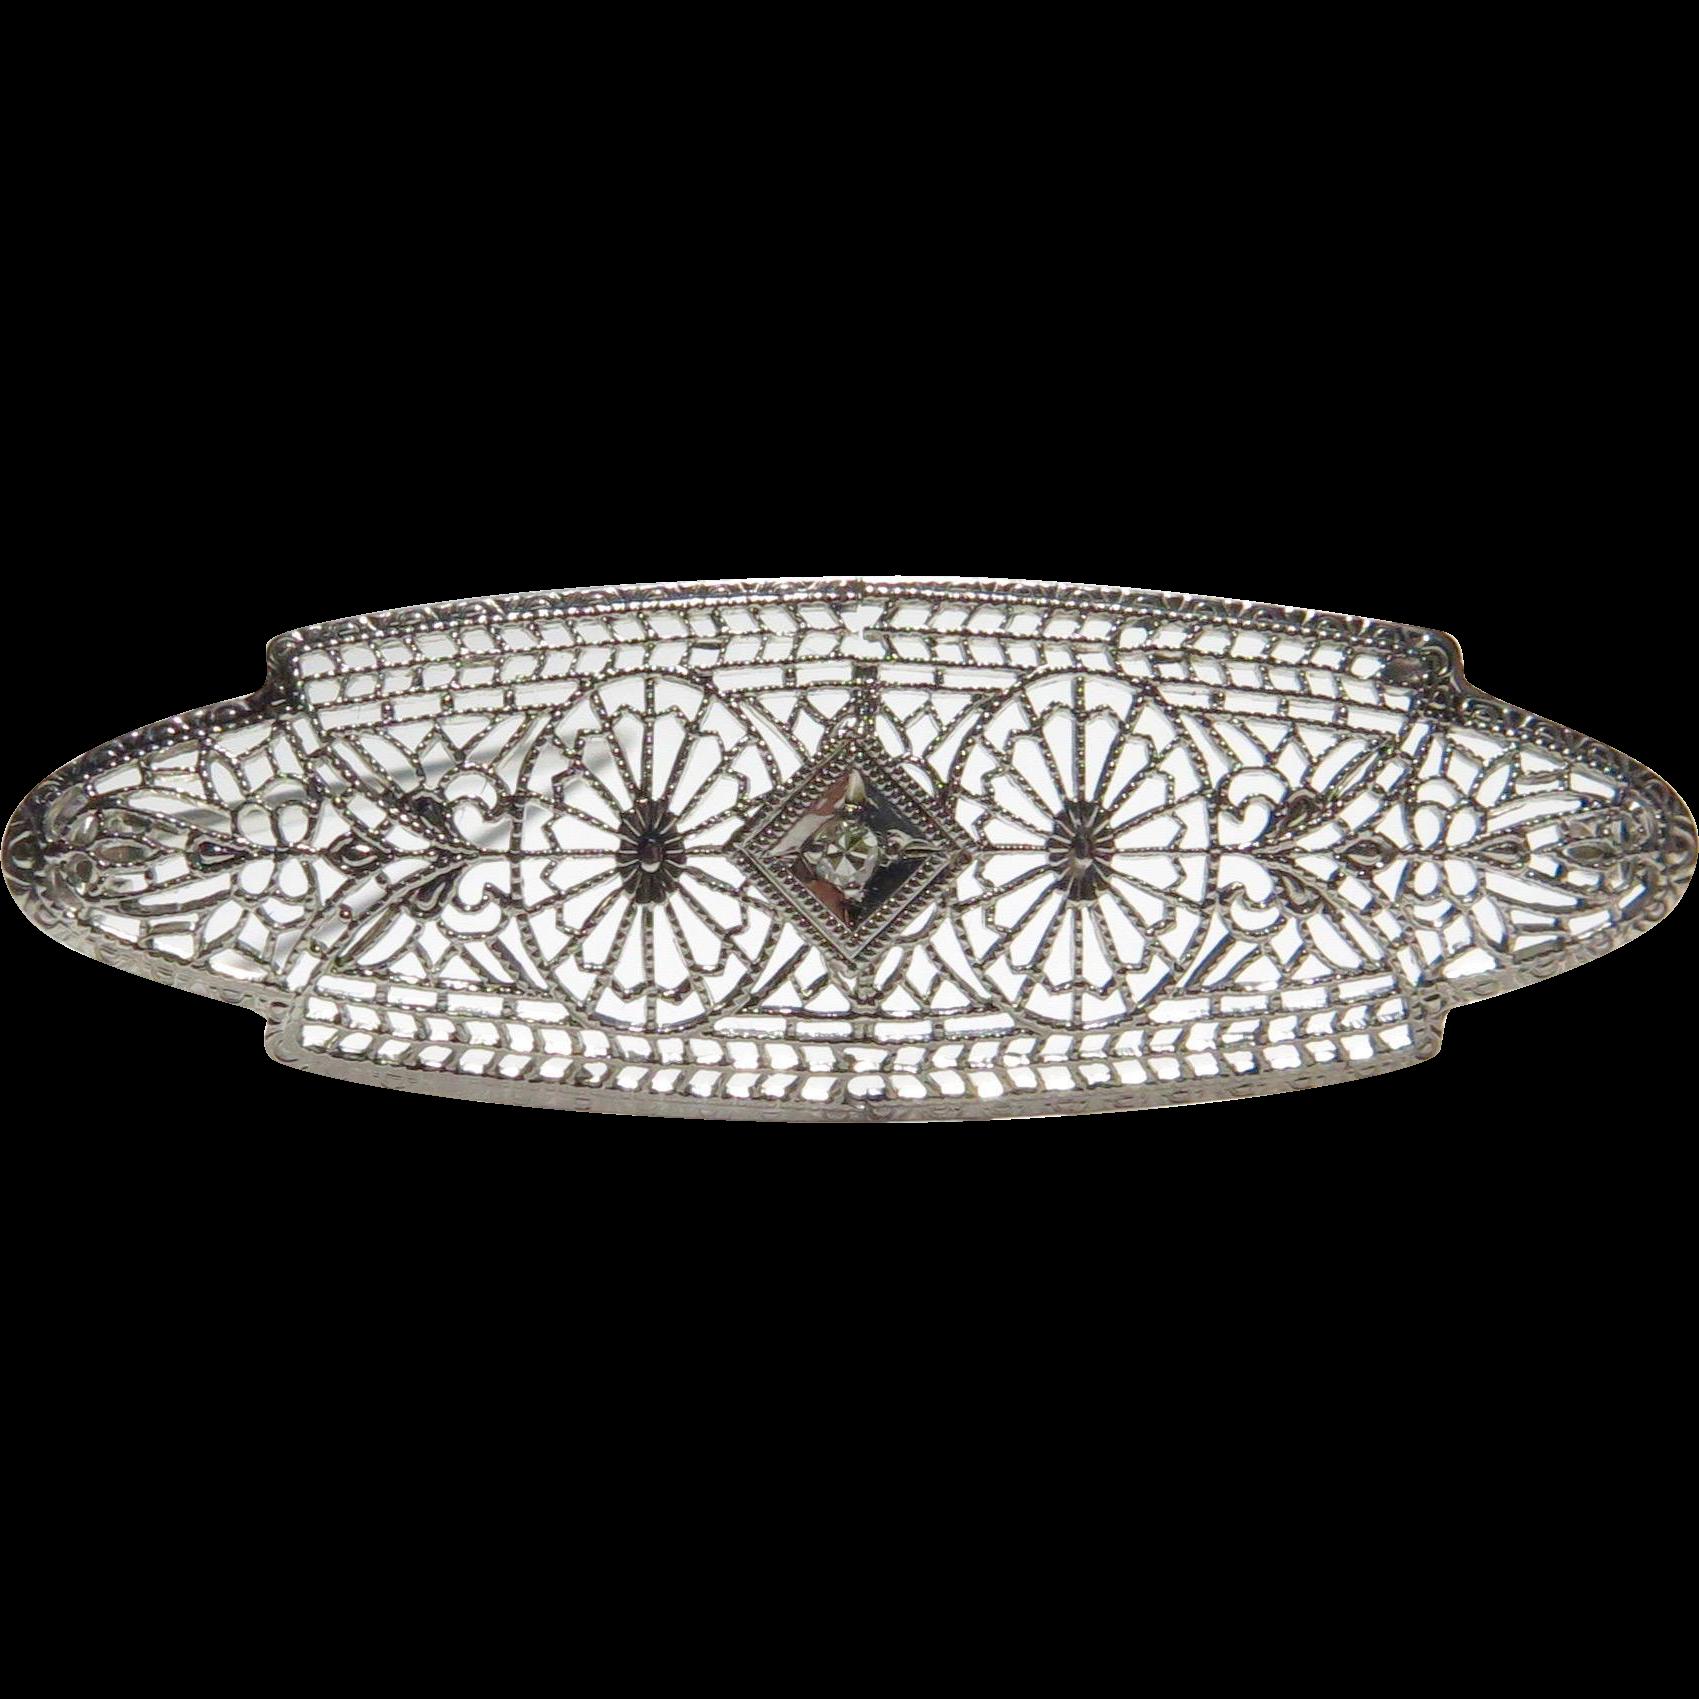 Antique Art Deco 10K White Gold Diamond Filigree Brooch